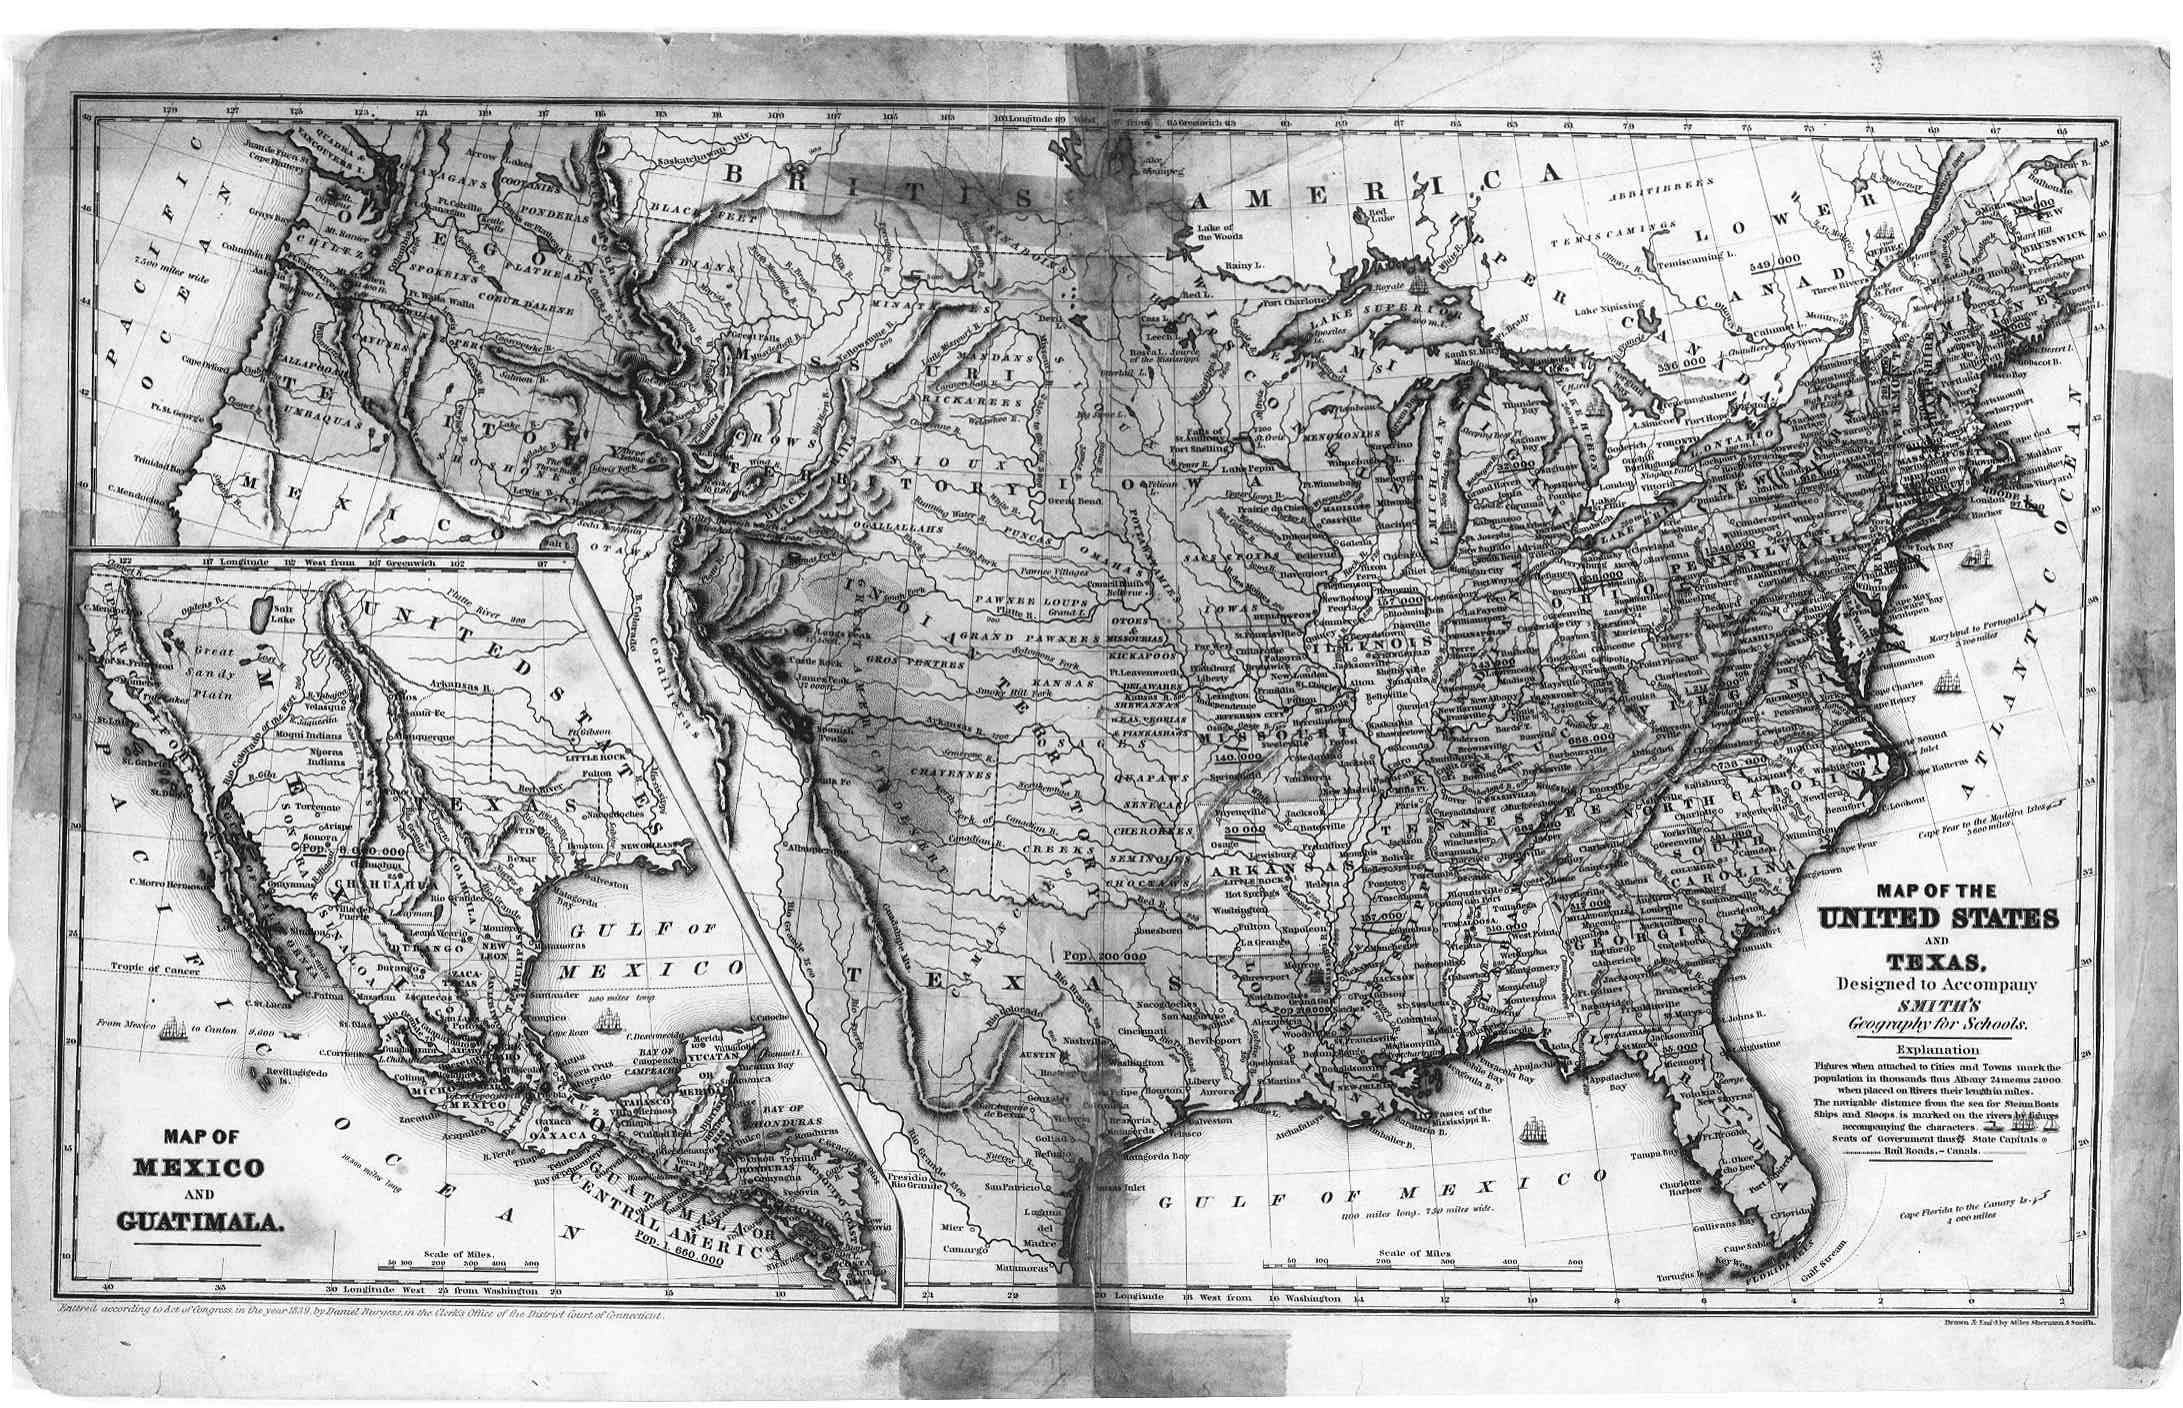 Worksheet. Utah Maps Utah Digital Map Library Table of Contents United